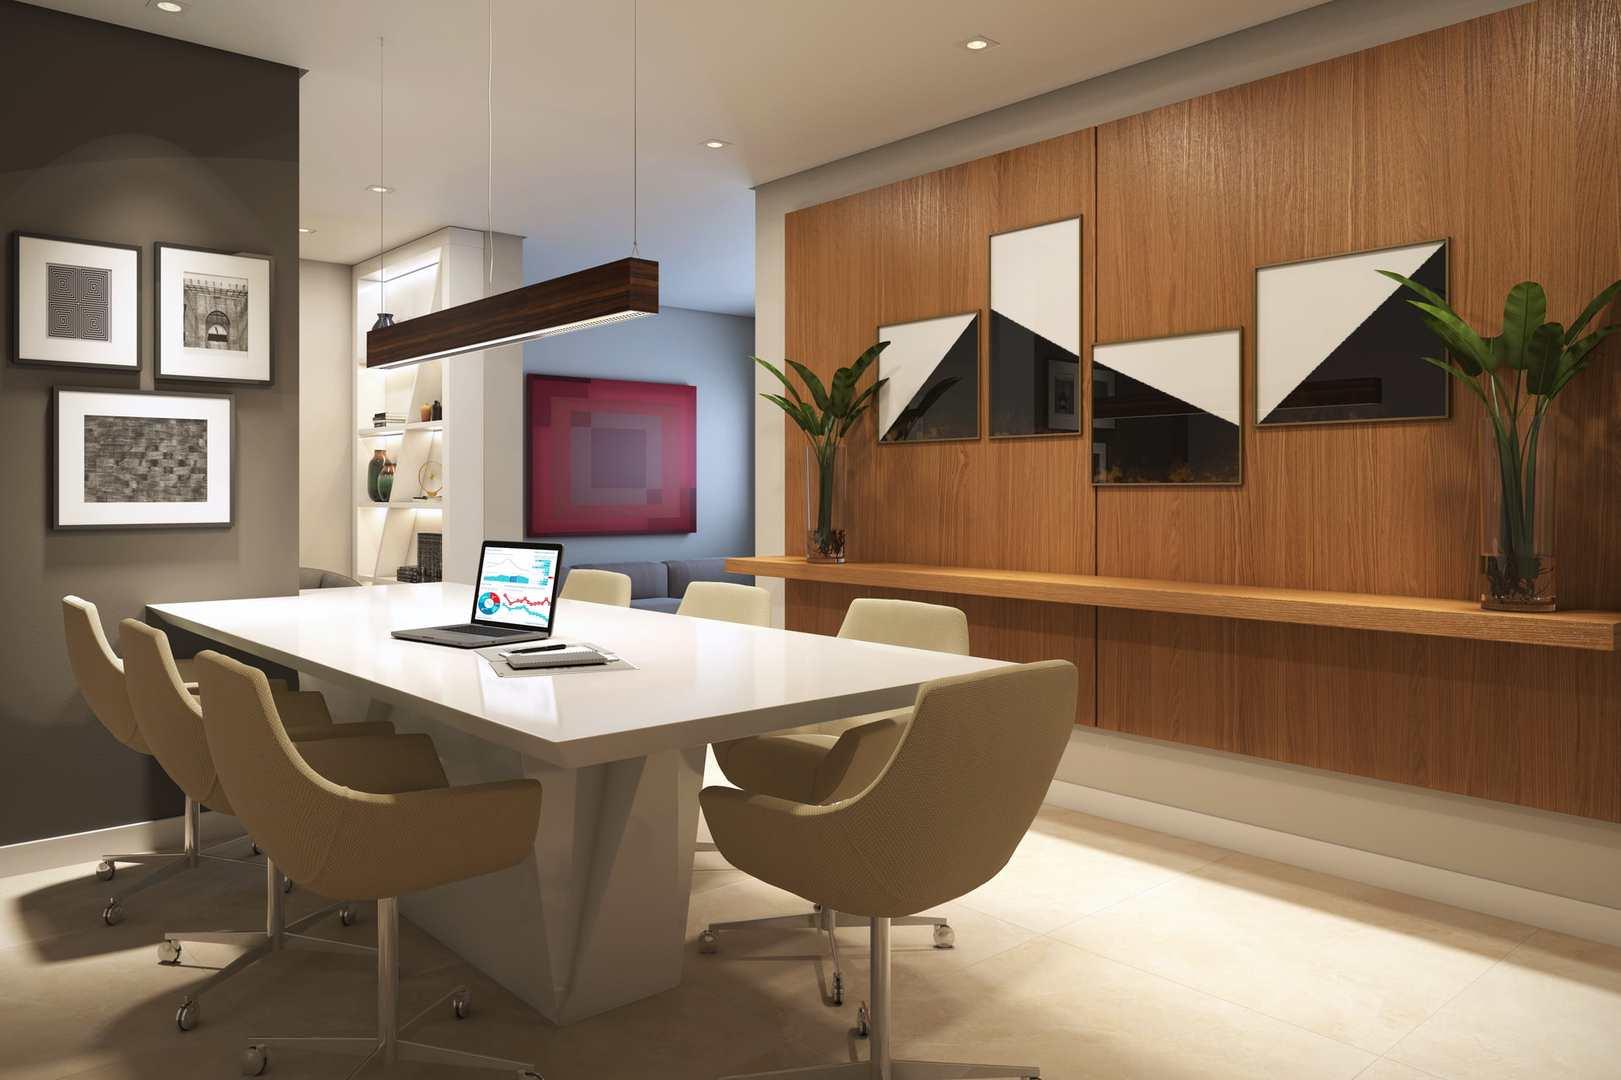 22-home-office-uber-miro-apartamento-ribeirao-preto